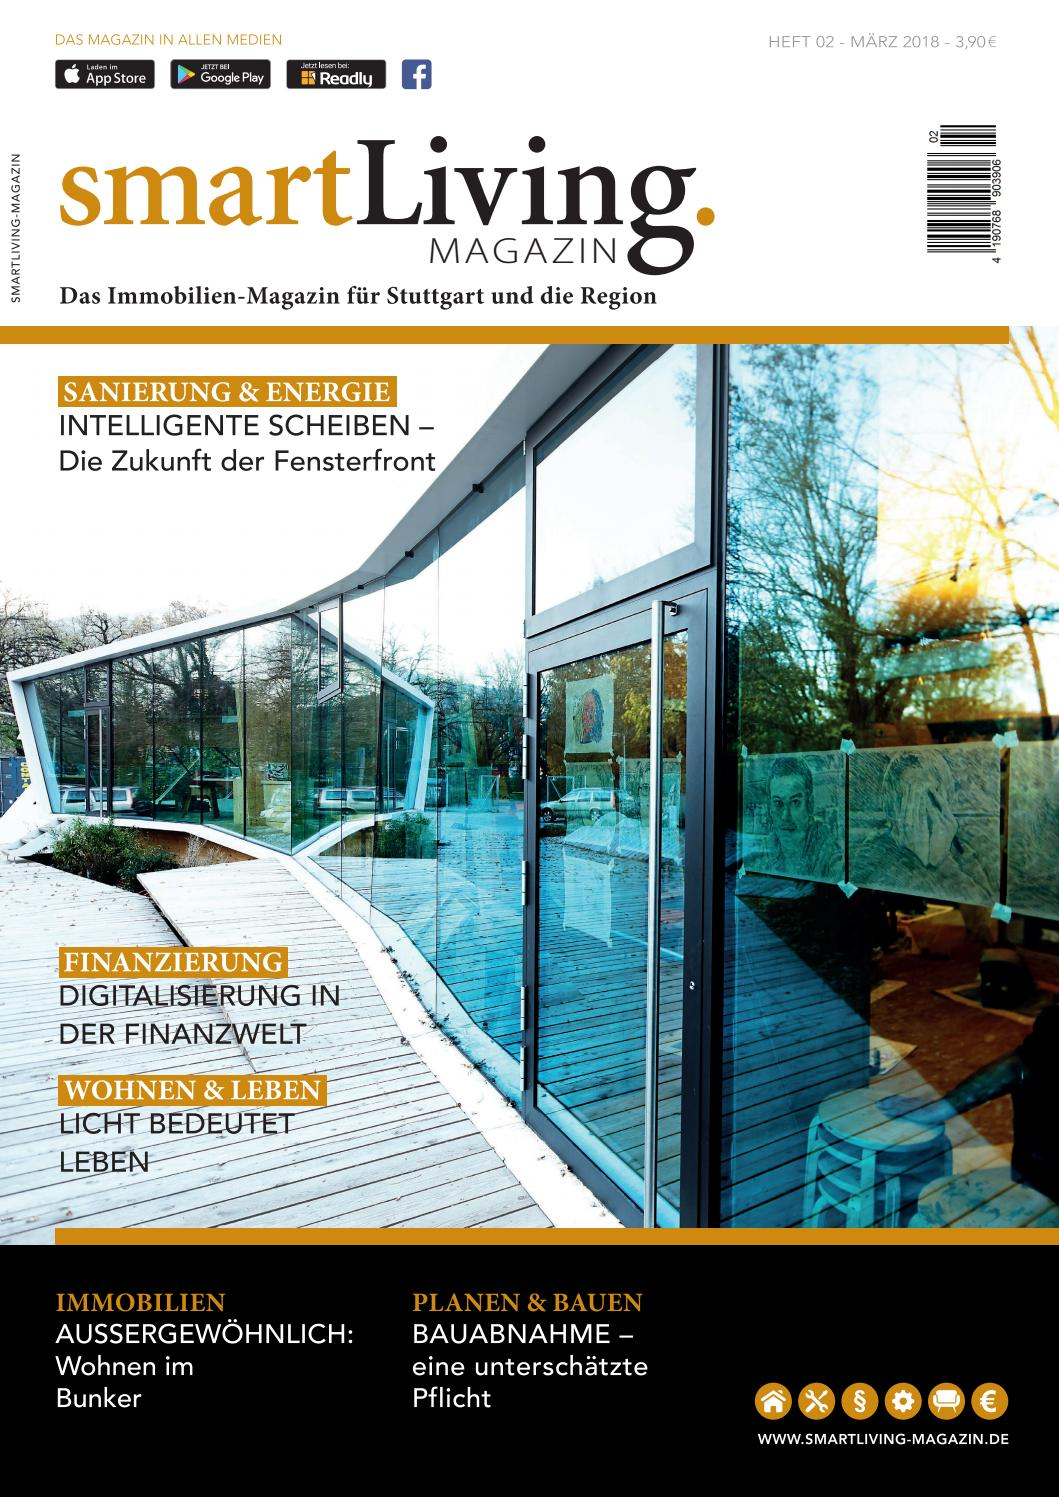 smartLiving Magazin 02/2018 by BEENKER&KOLLEGEN - issuu